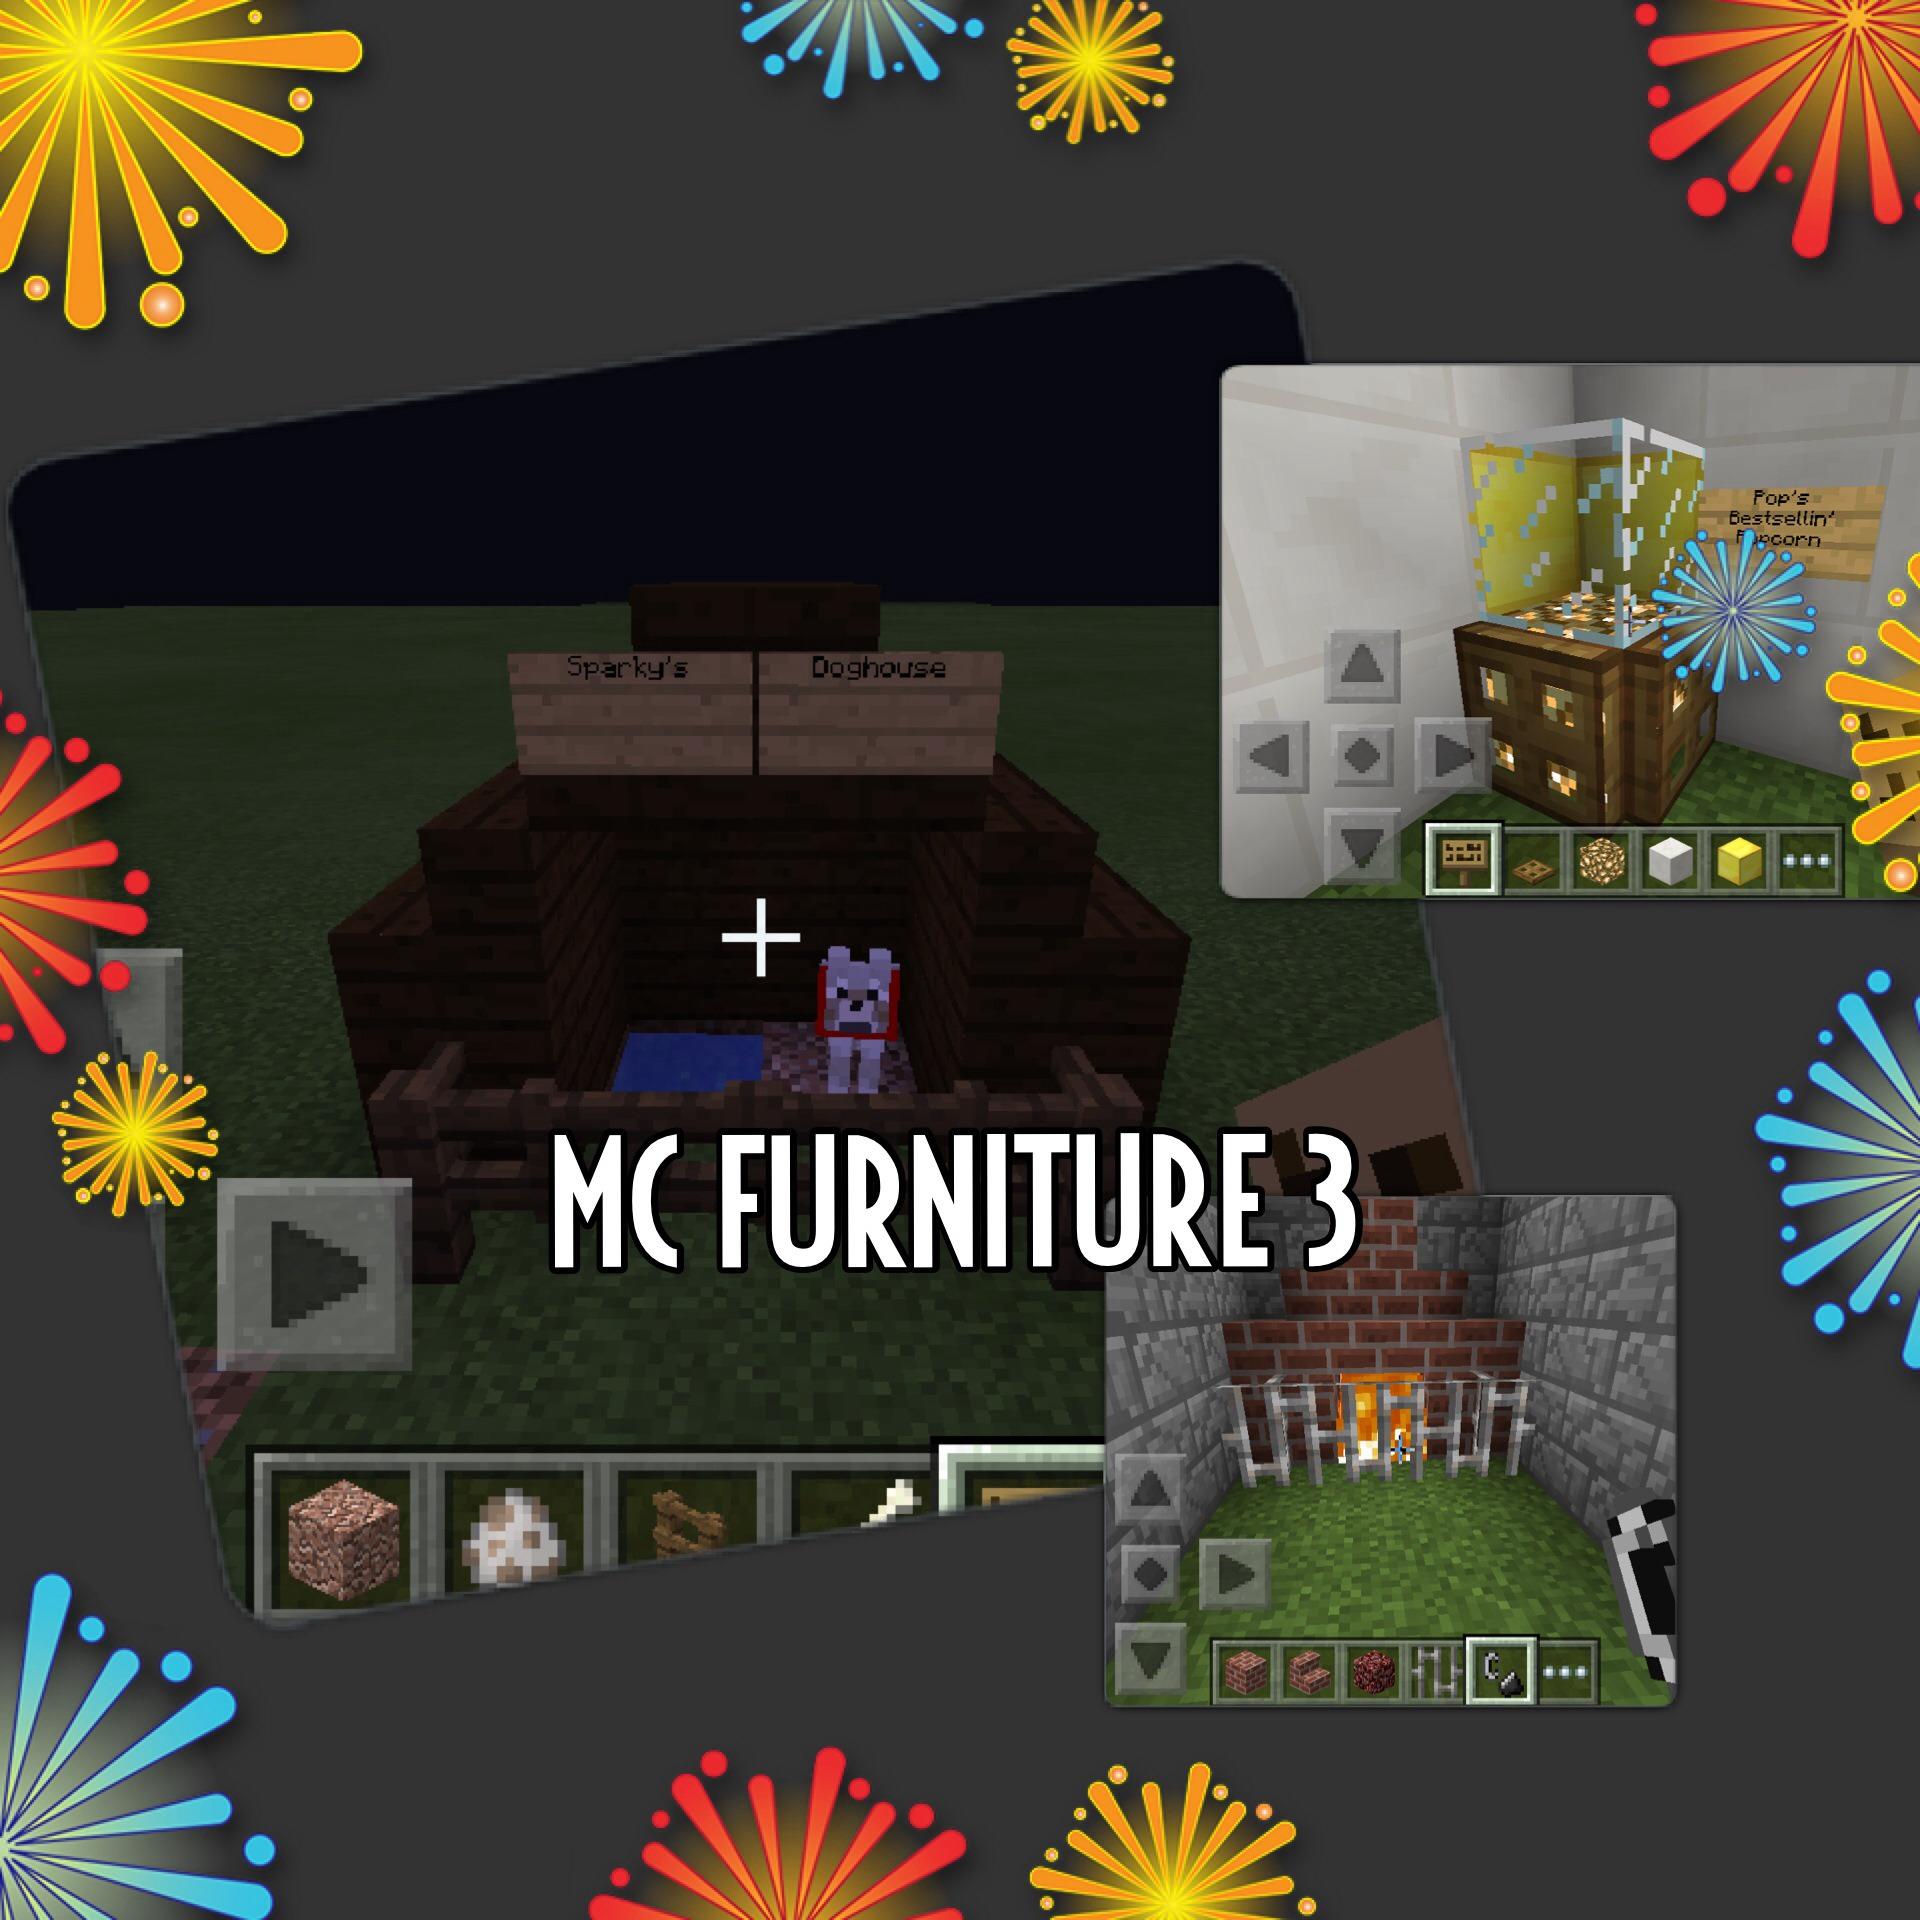 Picture of MC Furniture 3